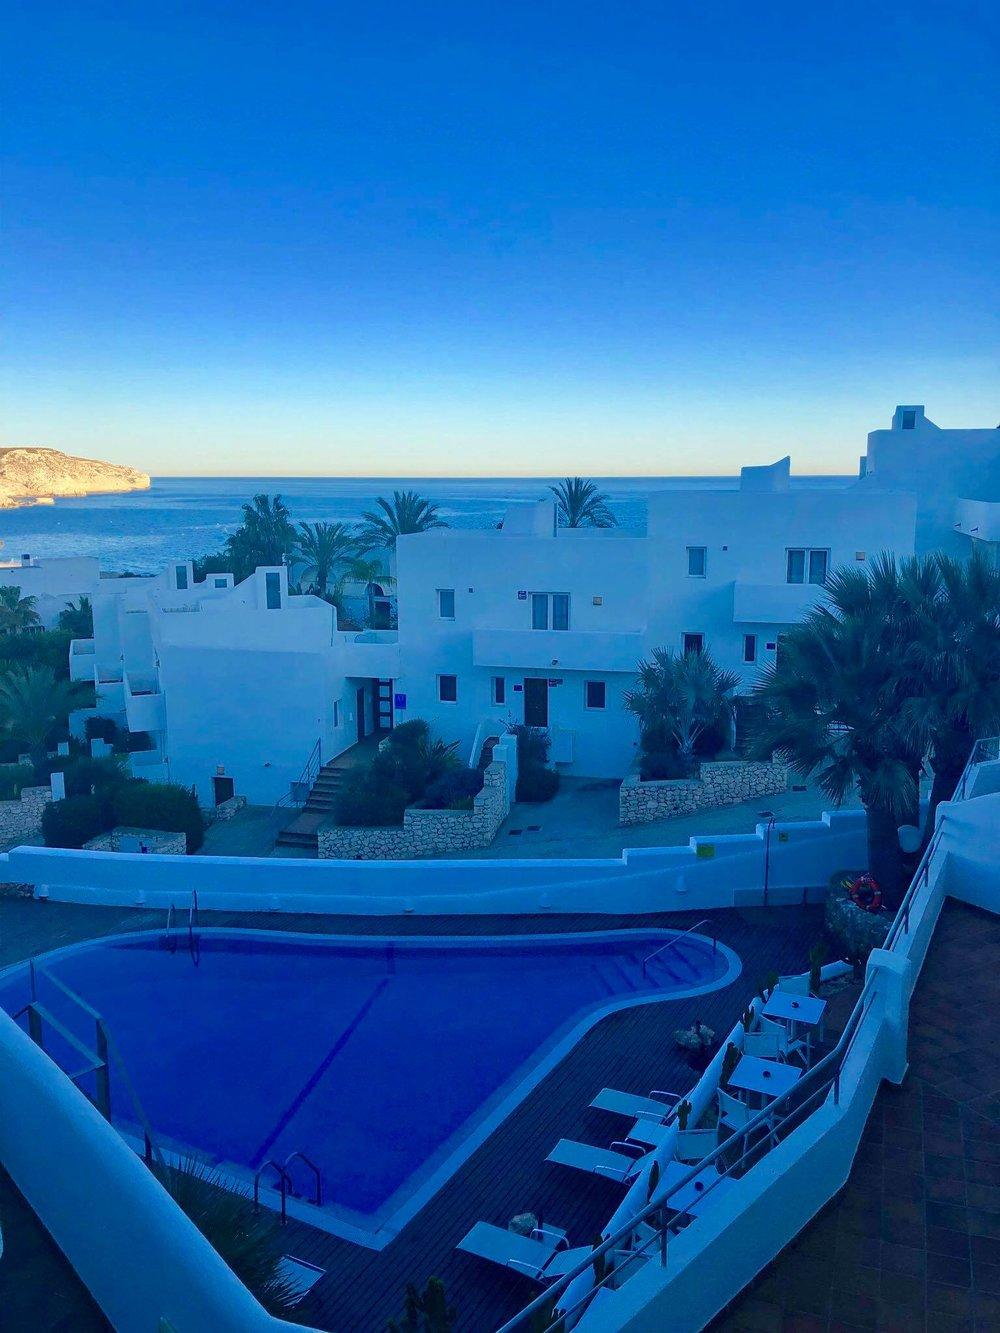 Kach Solo Travels in 2019 Spain you're so beautiful23.jpg